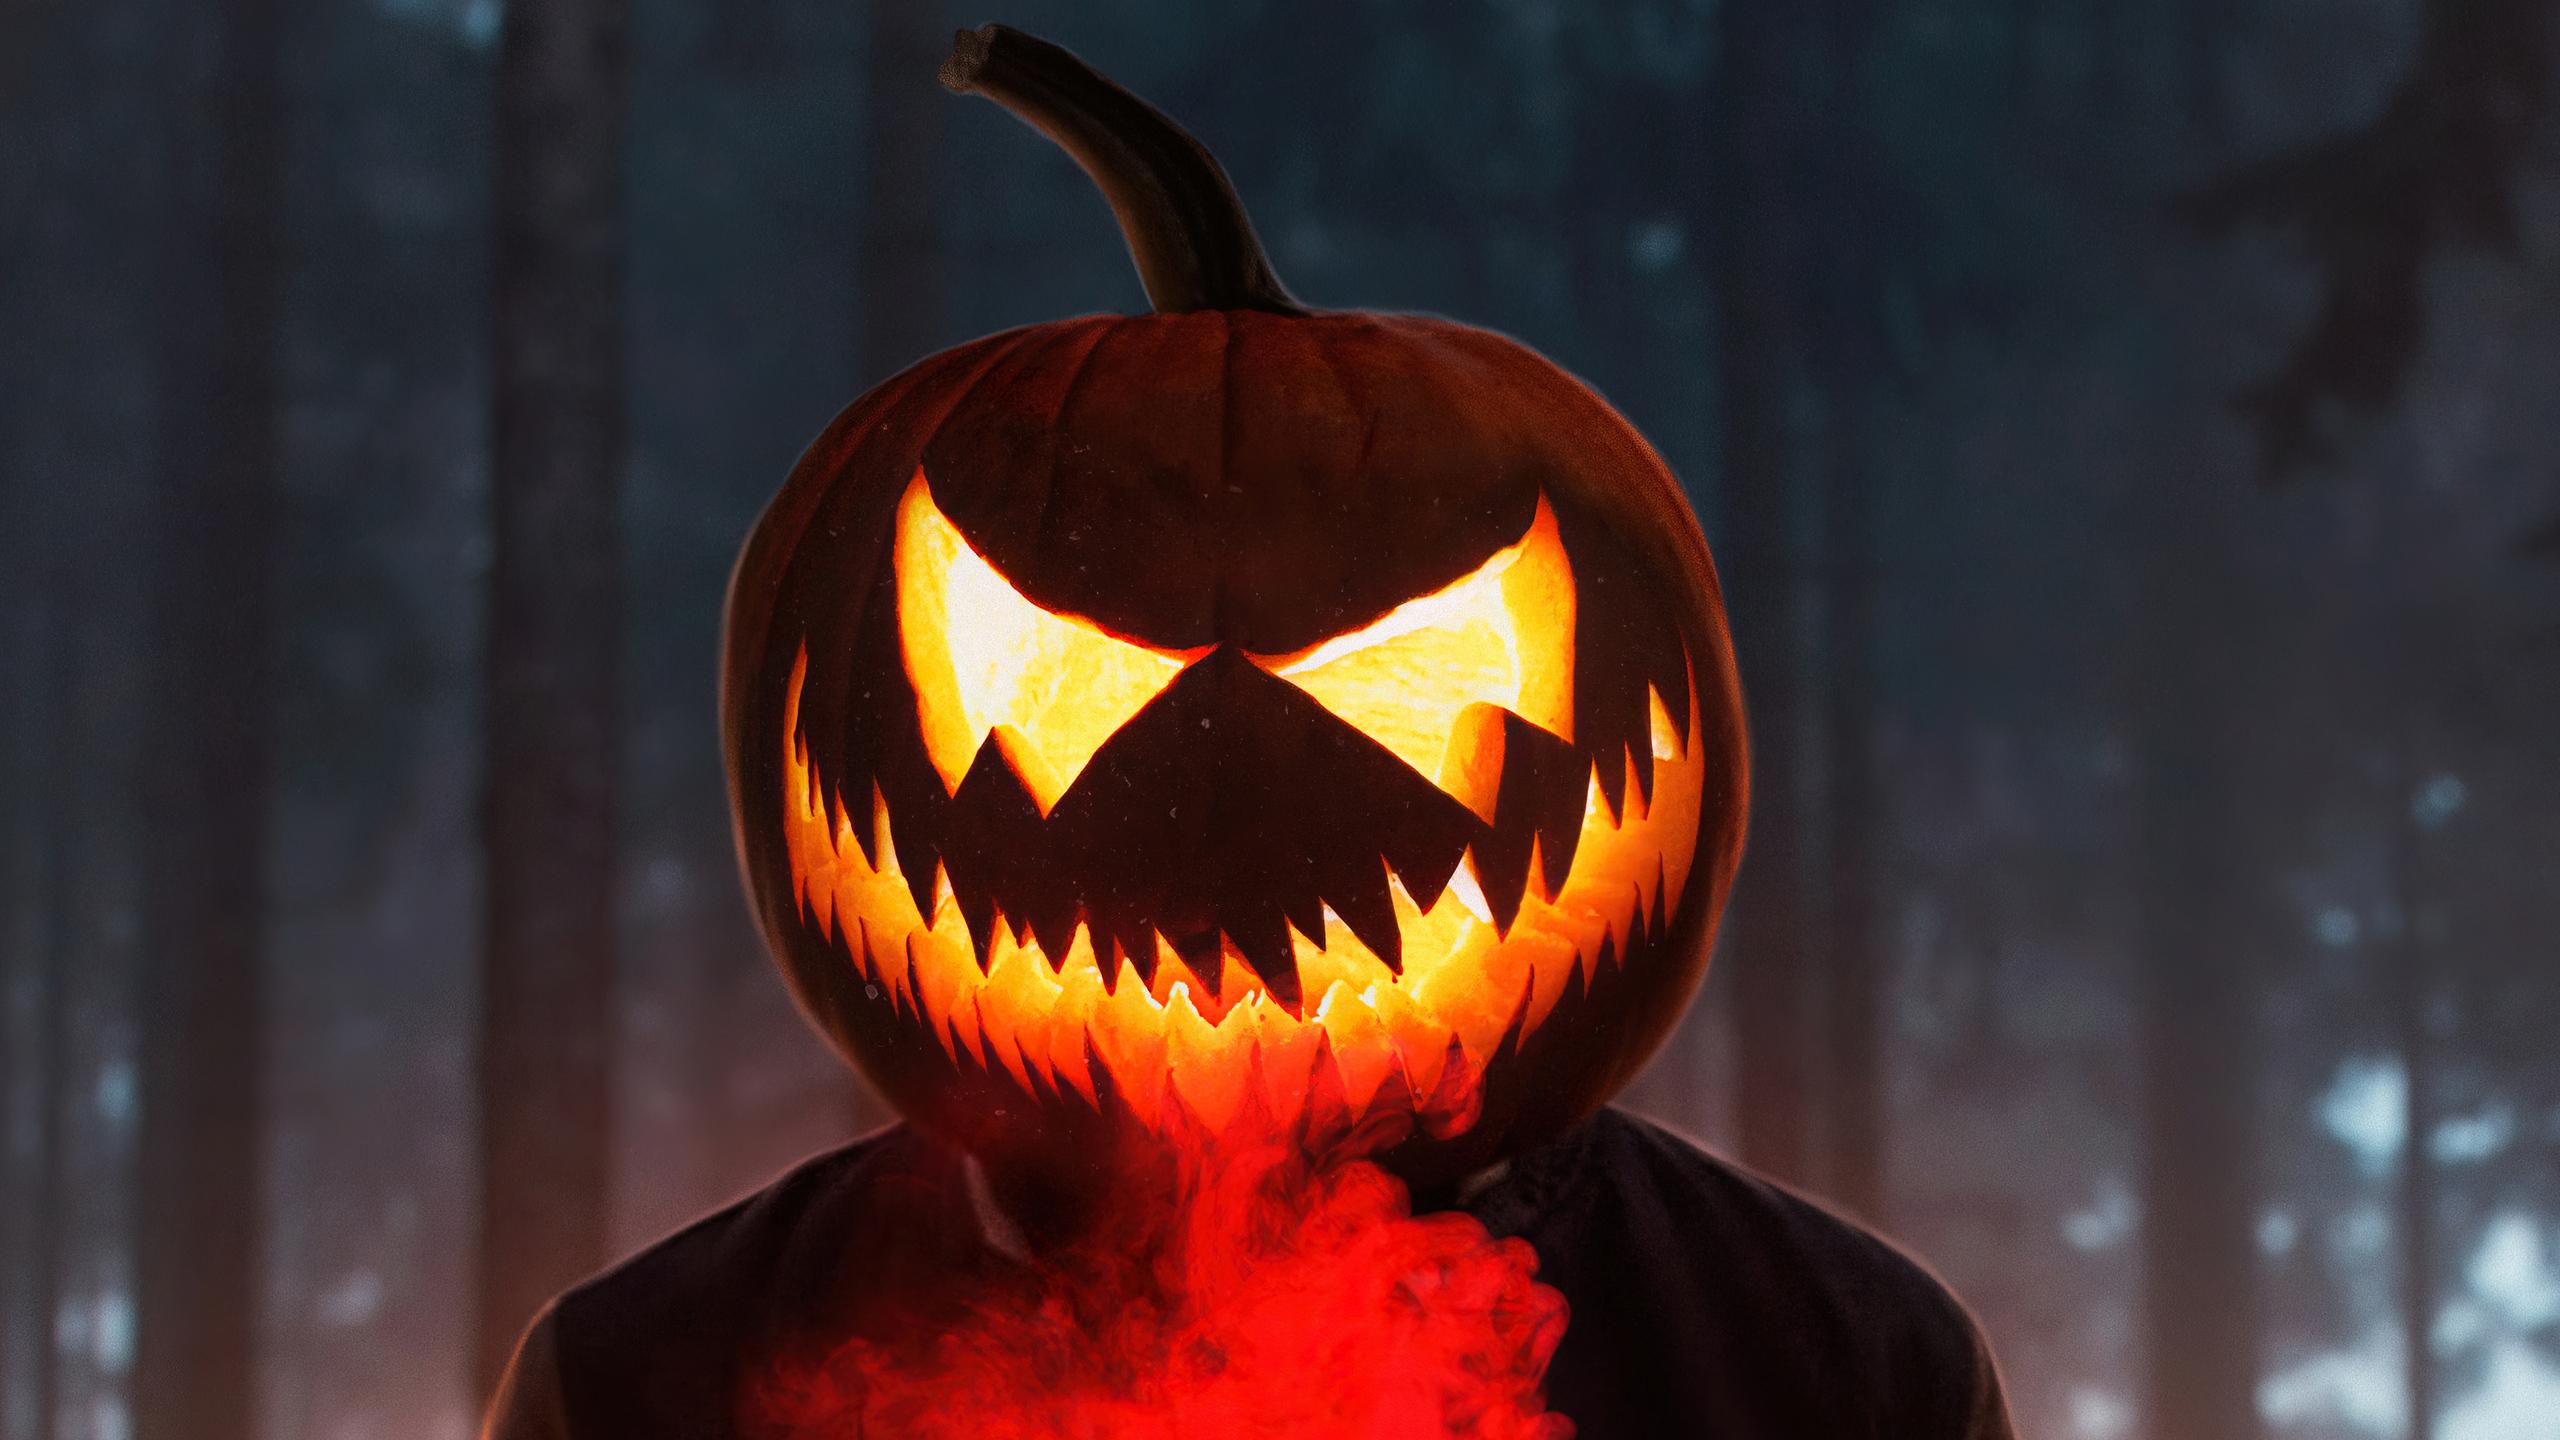 2560x1440 Halloween Glowing Mask Boy 4k 1440P Resolution ...